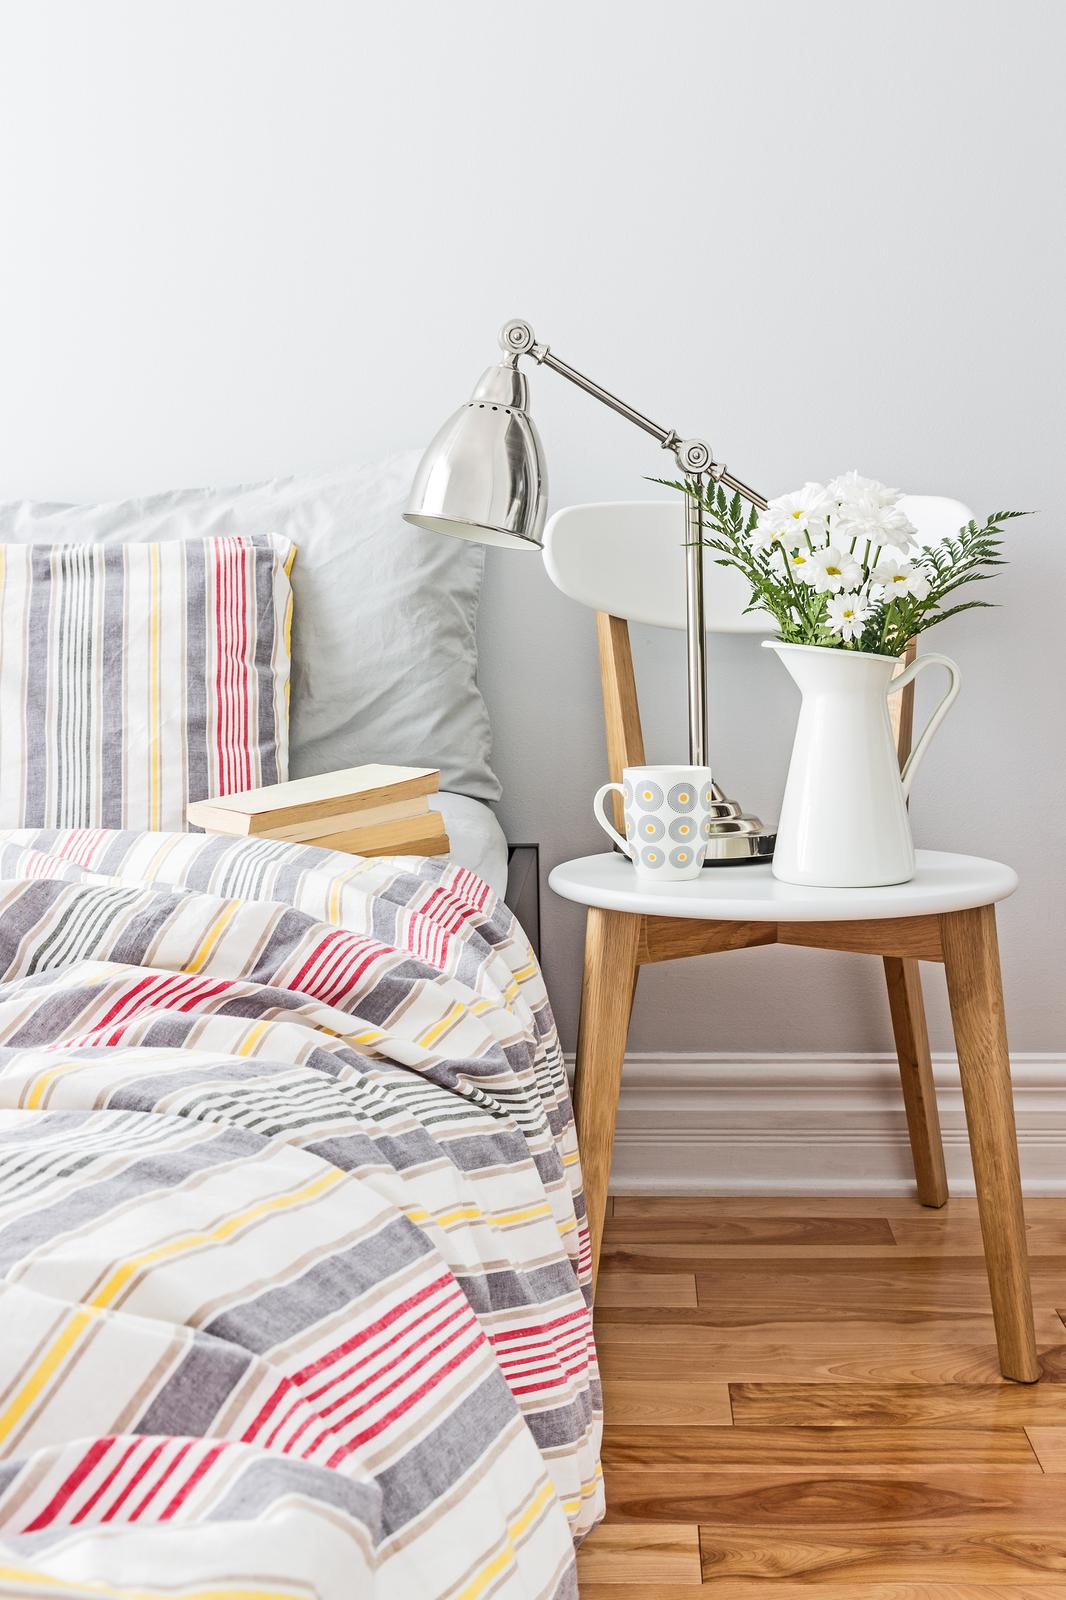 bigstock-Fresh-And-Bright-Bedroom-Decor-45838267.jpg